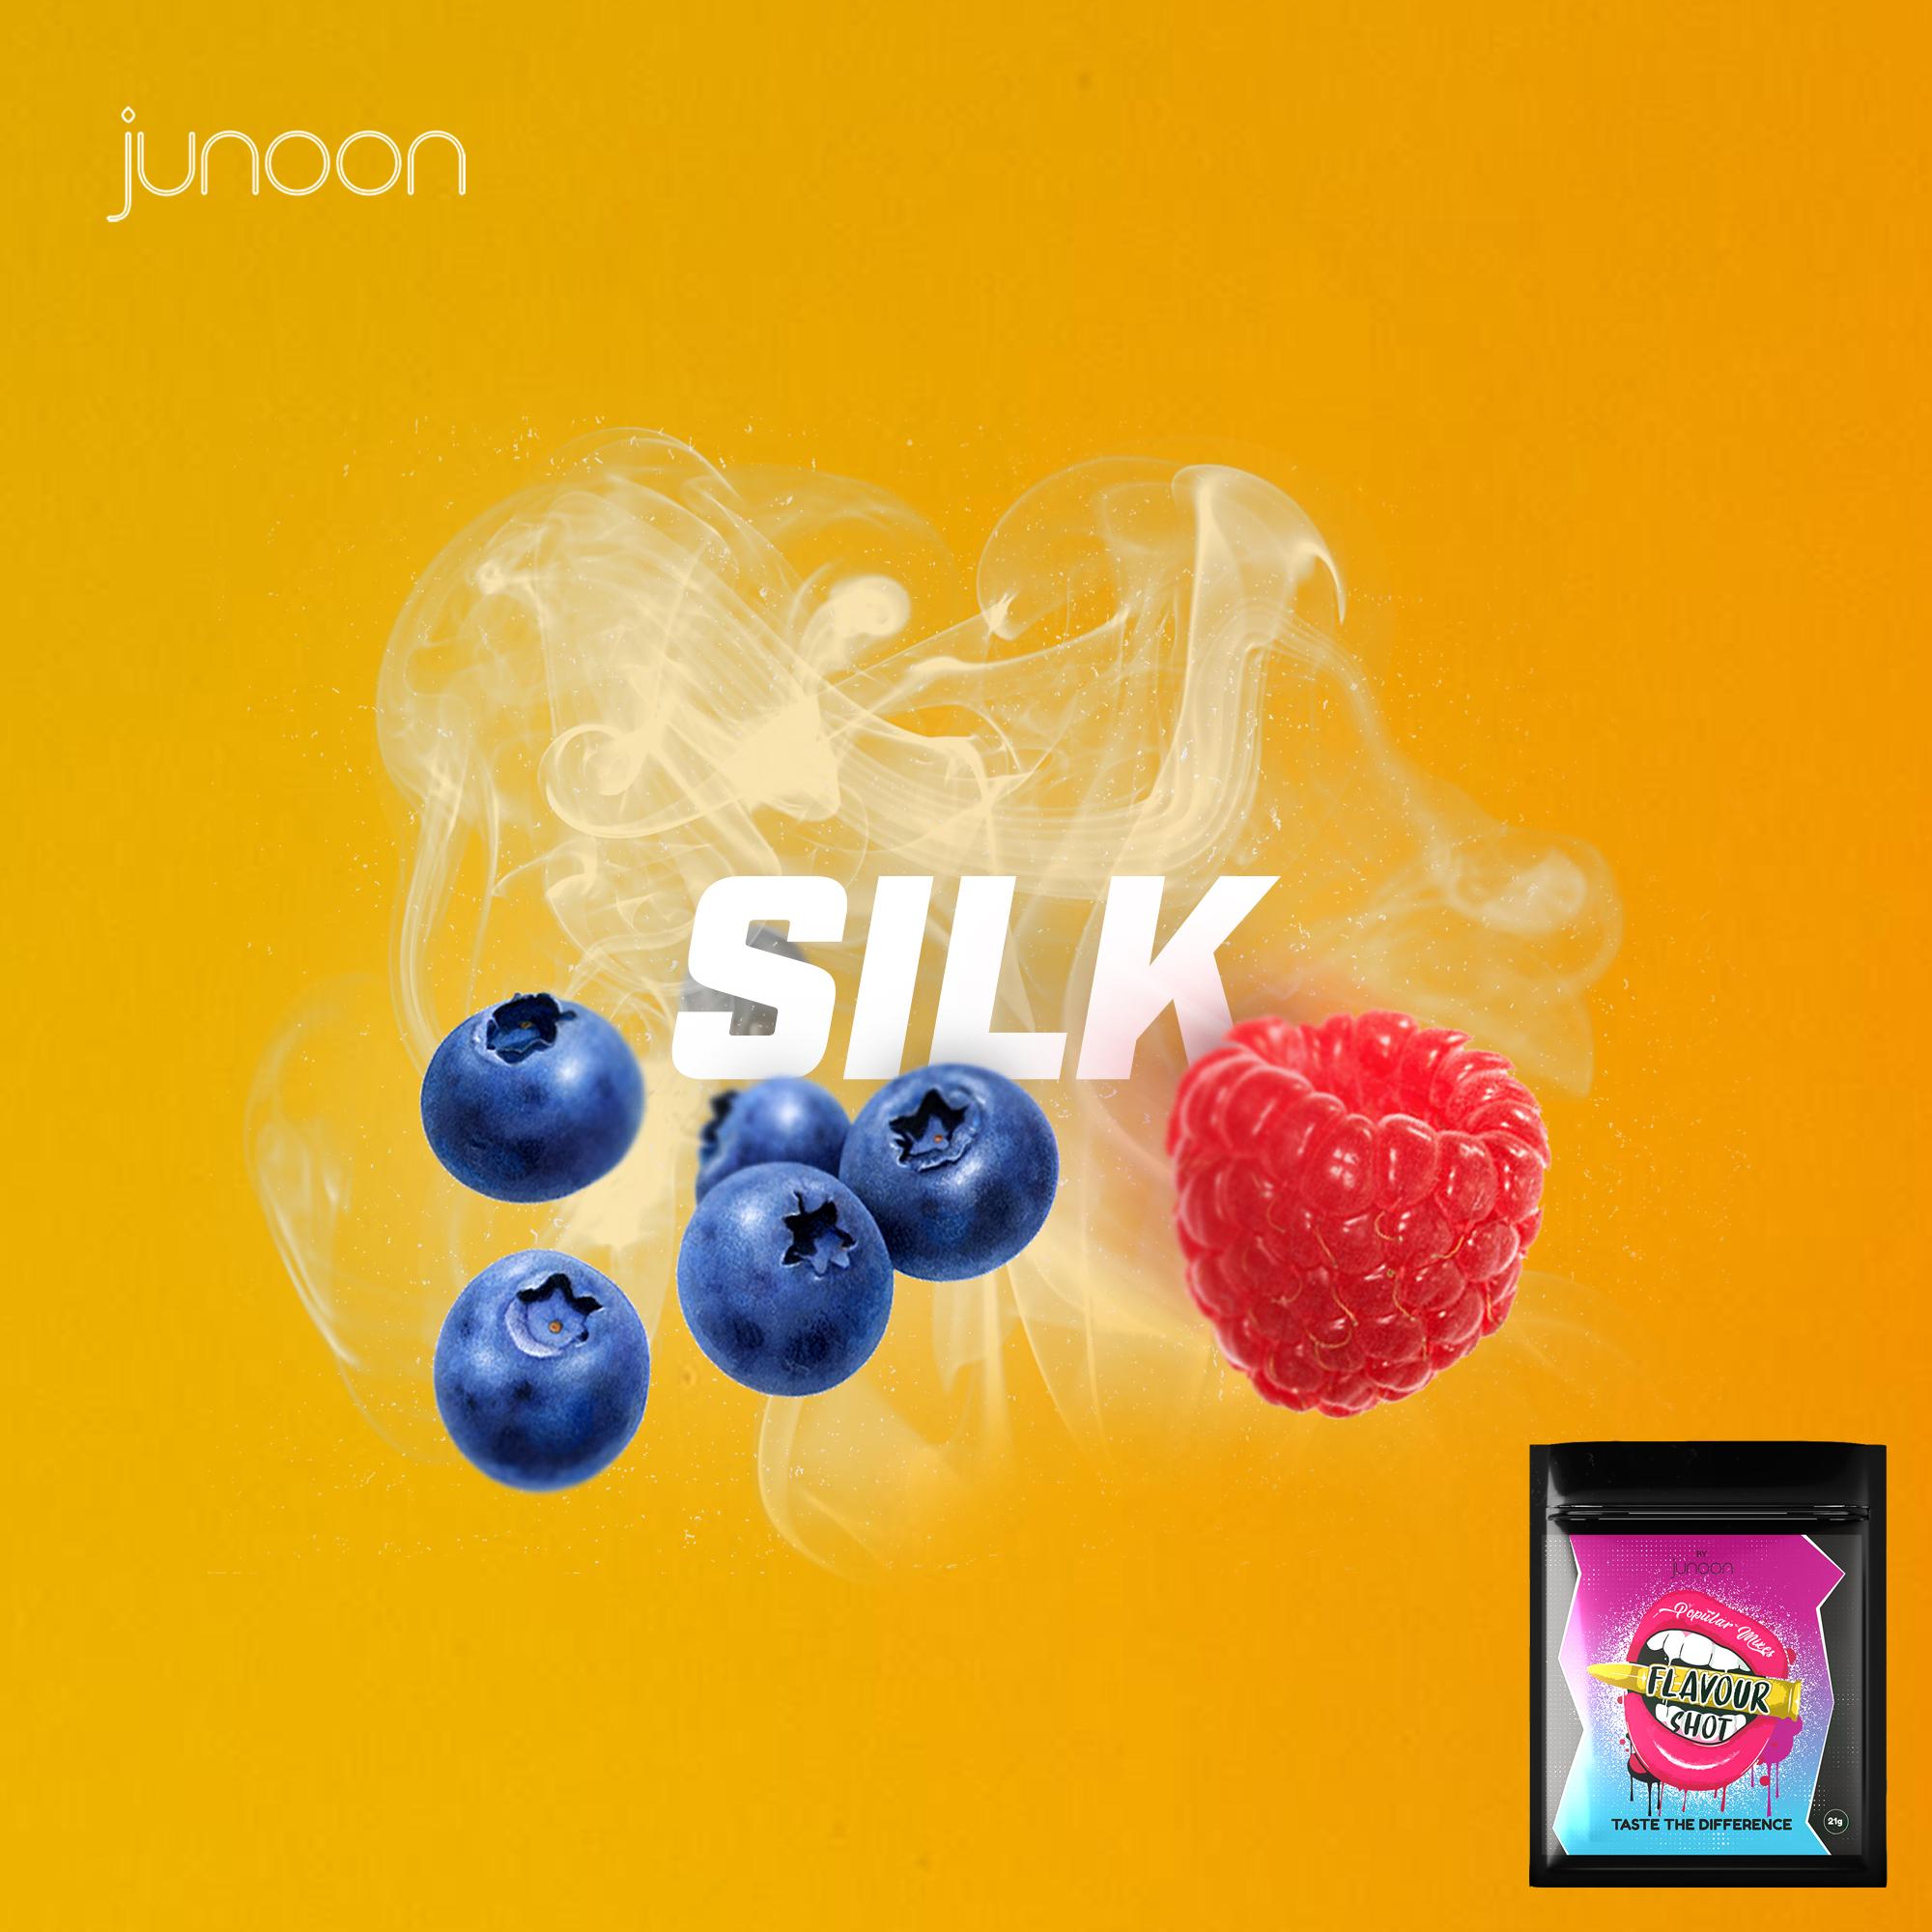 Silk (Blueberry, Raspberry & Freshmist)